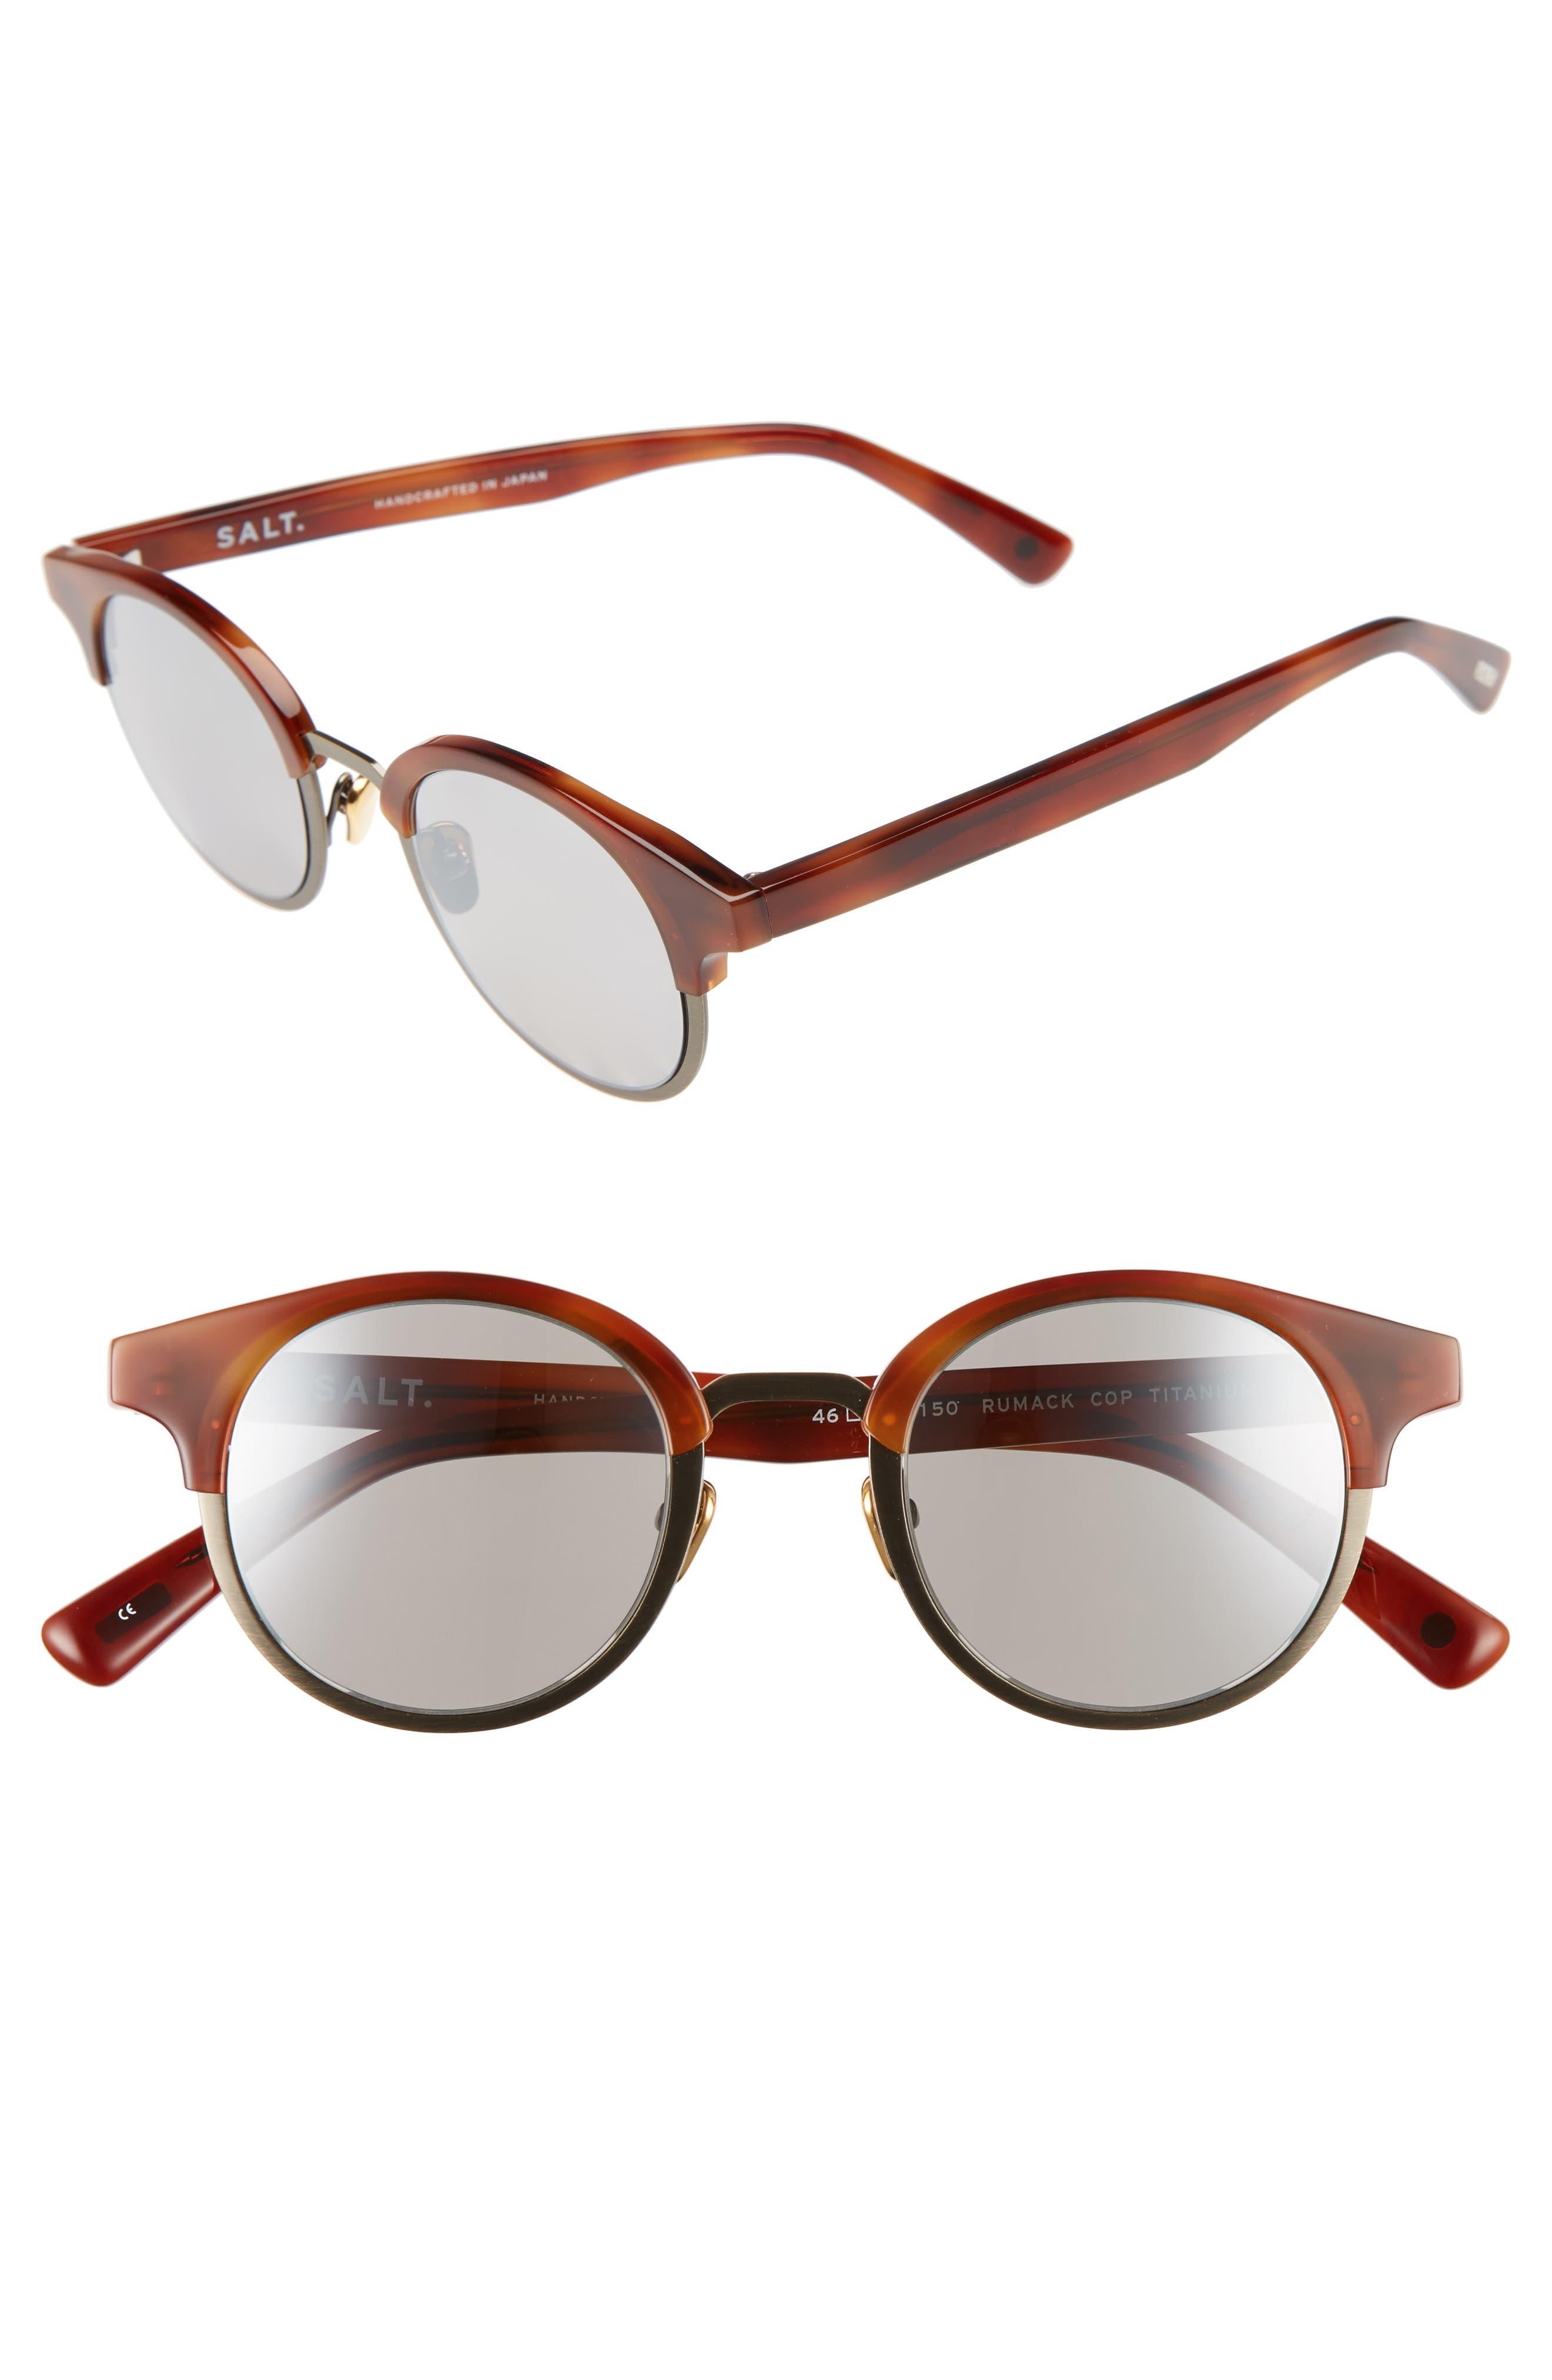 Main Image - Salt Rumack 46mm Polarized Sunglasses